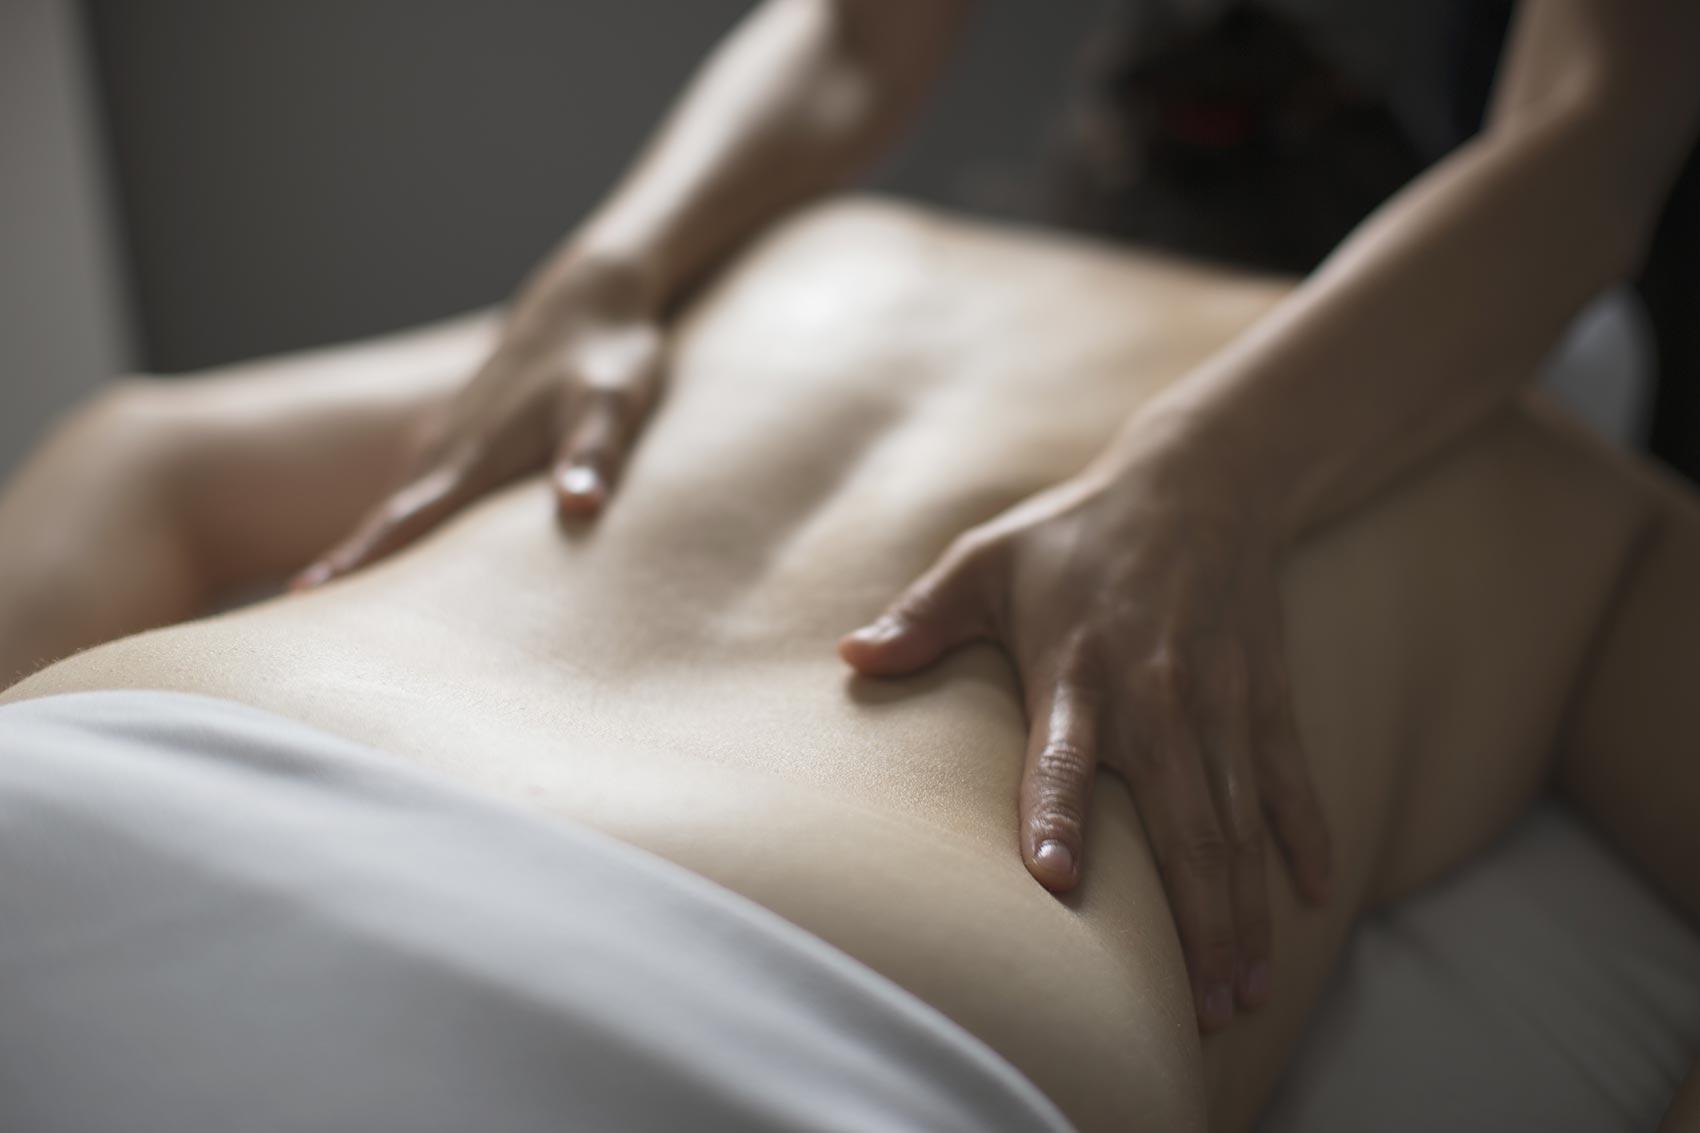 Massothérapie - Massage